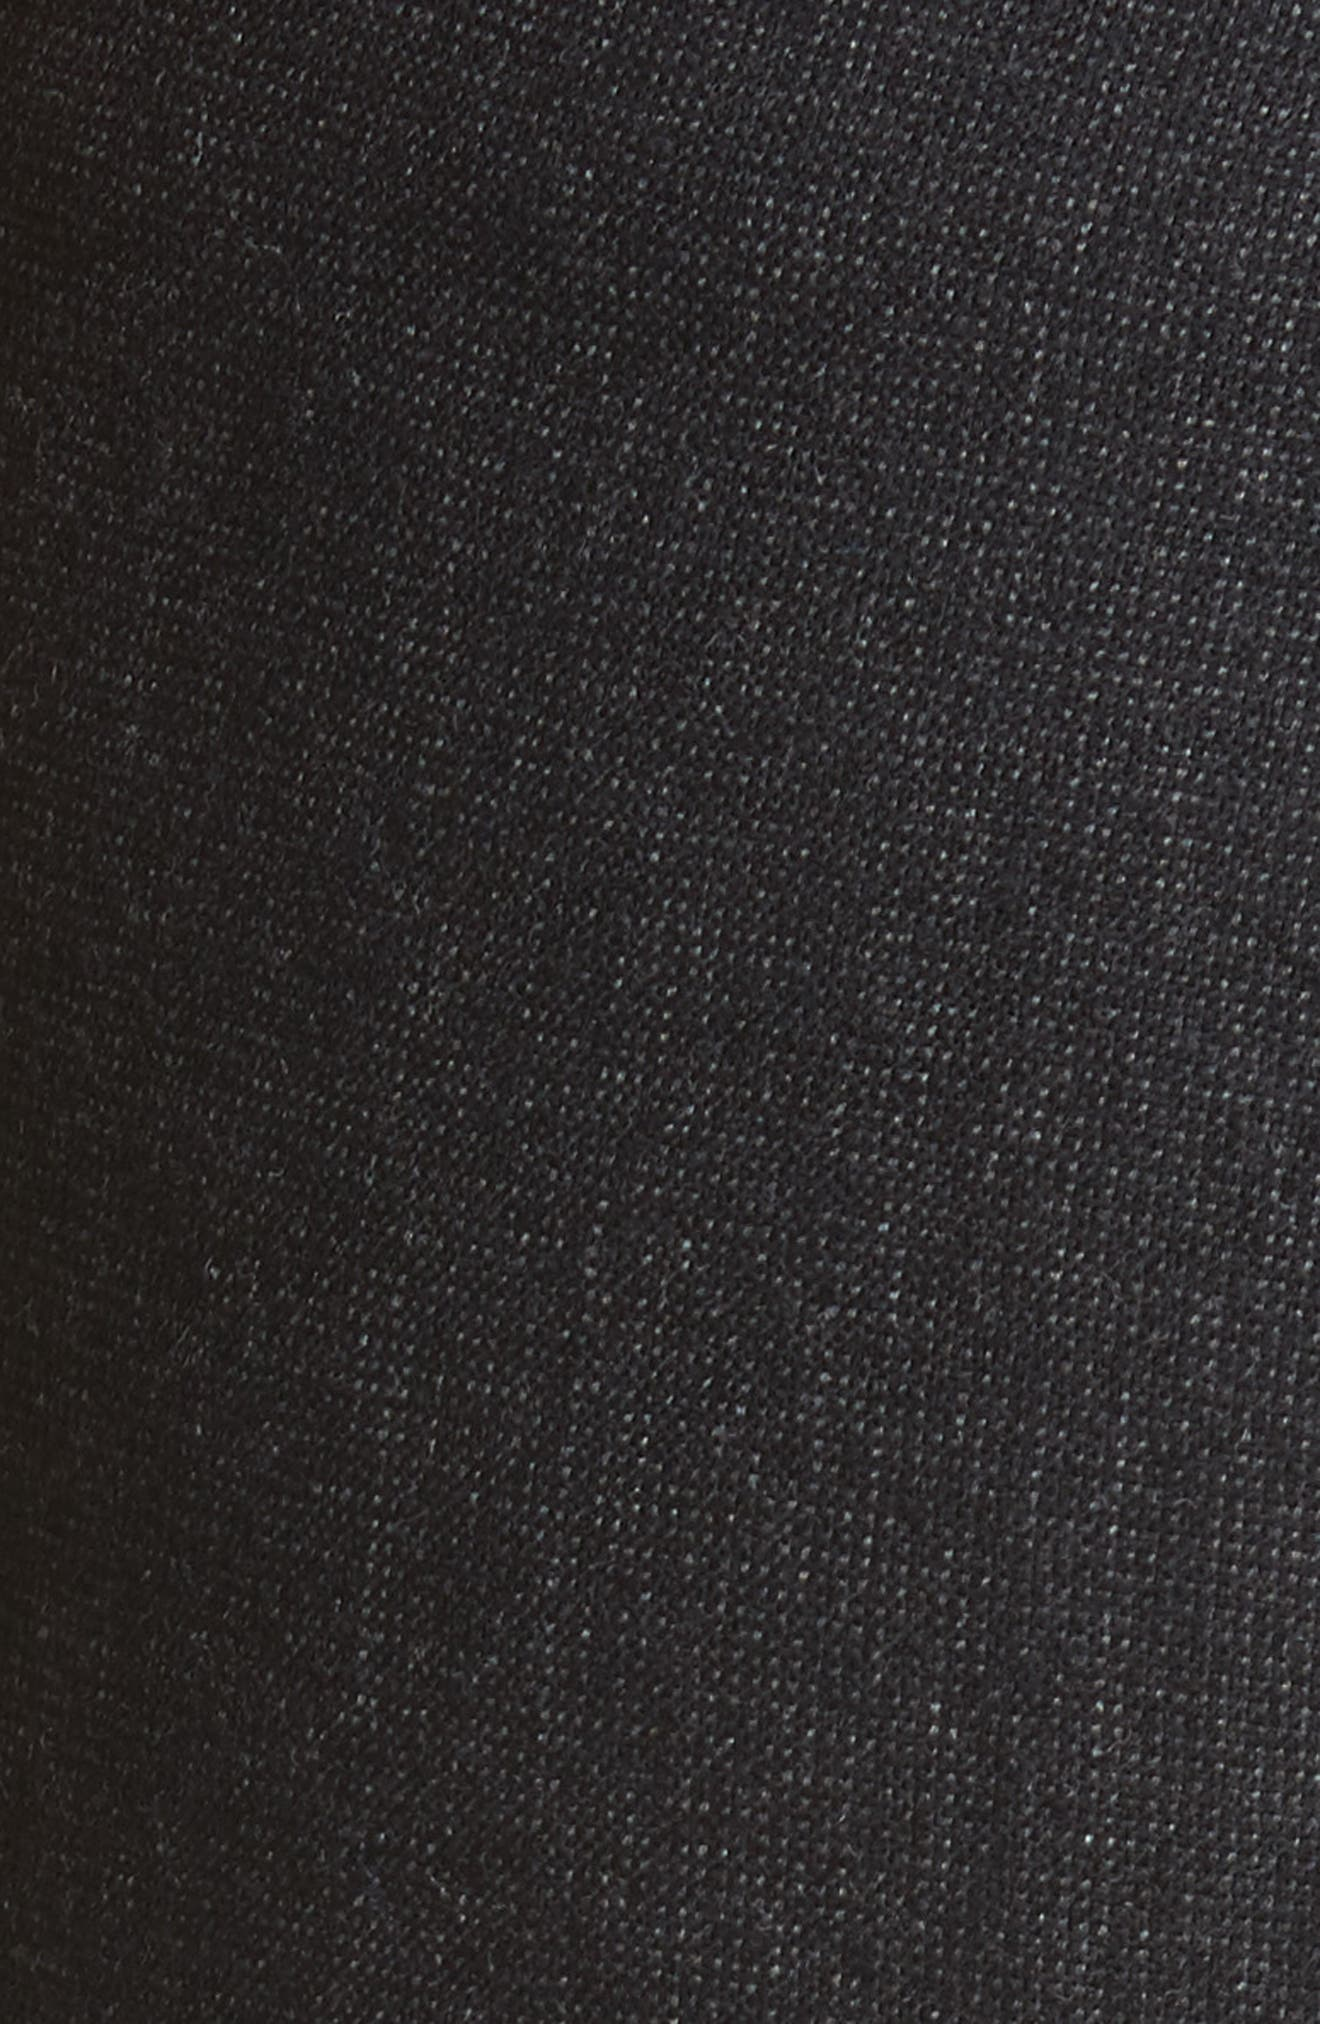 Armani Jeans Stretch Wool Slim Pants,                             Alternate thumbnail 5, color,                             001